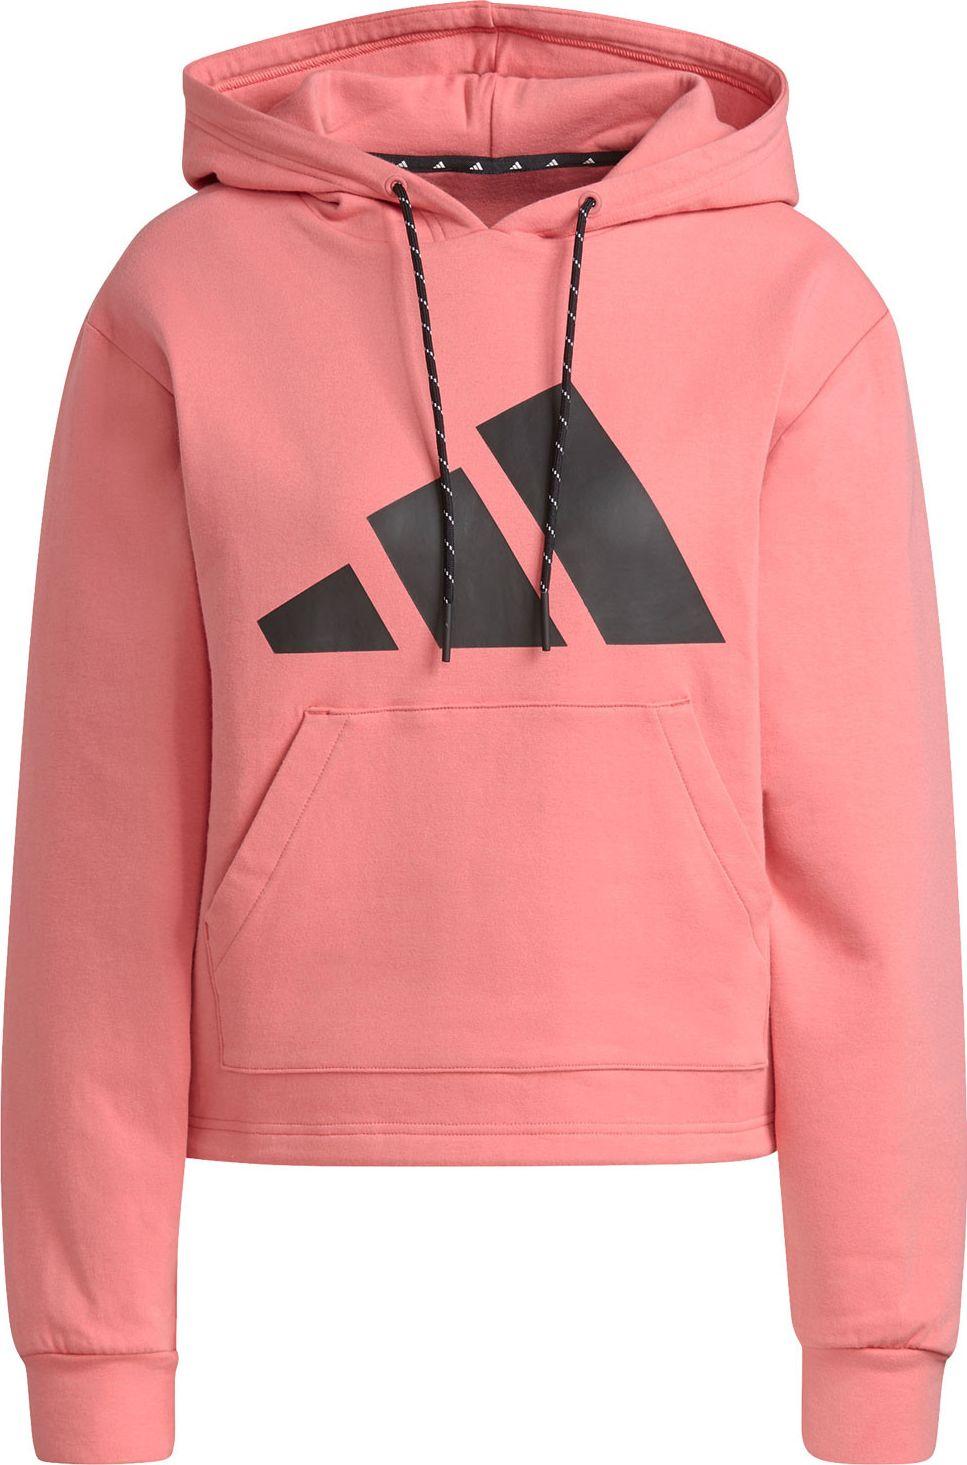 Adidas adidas WMNS Relaxed Fit Logo bluza 501 : Rozmiar - M